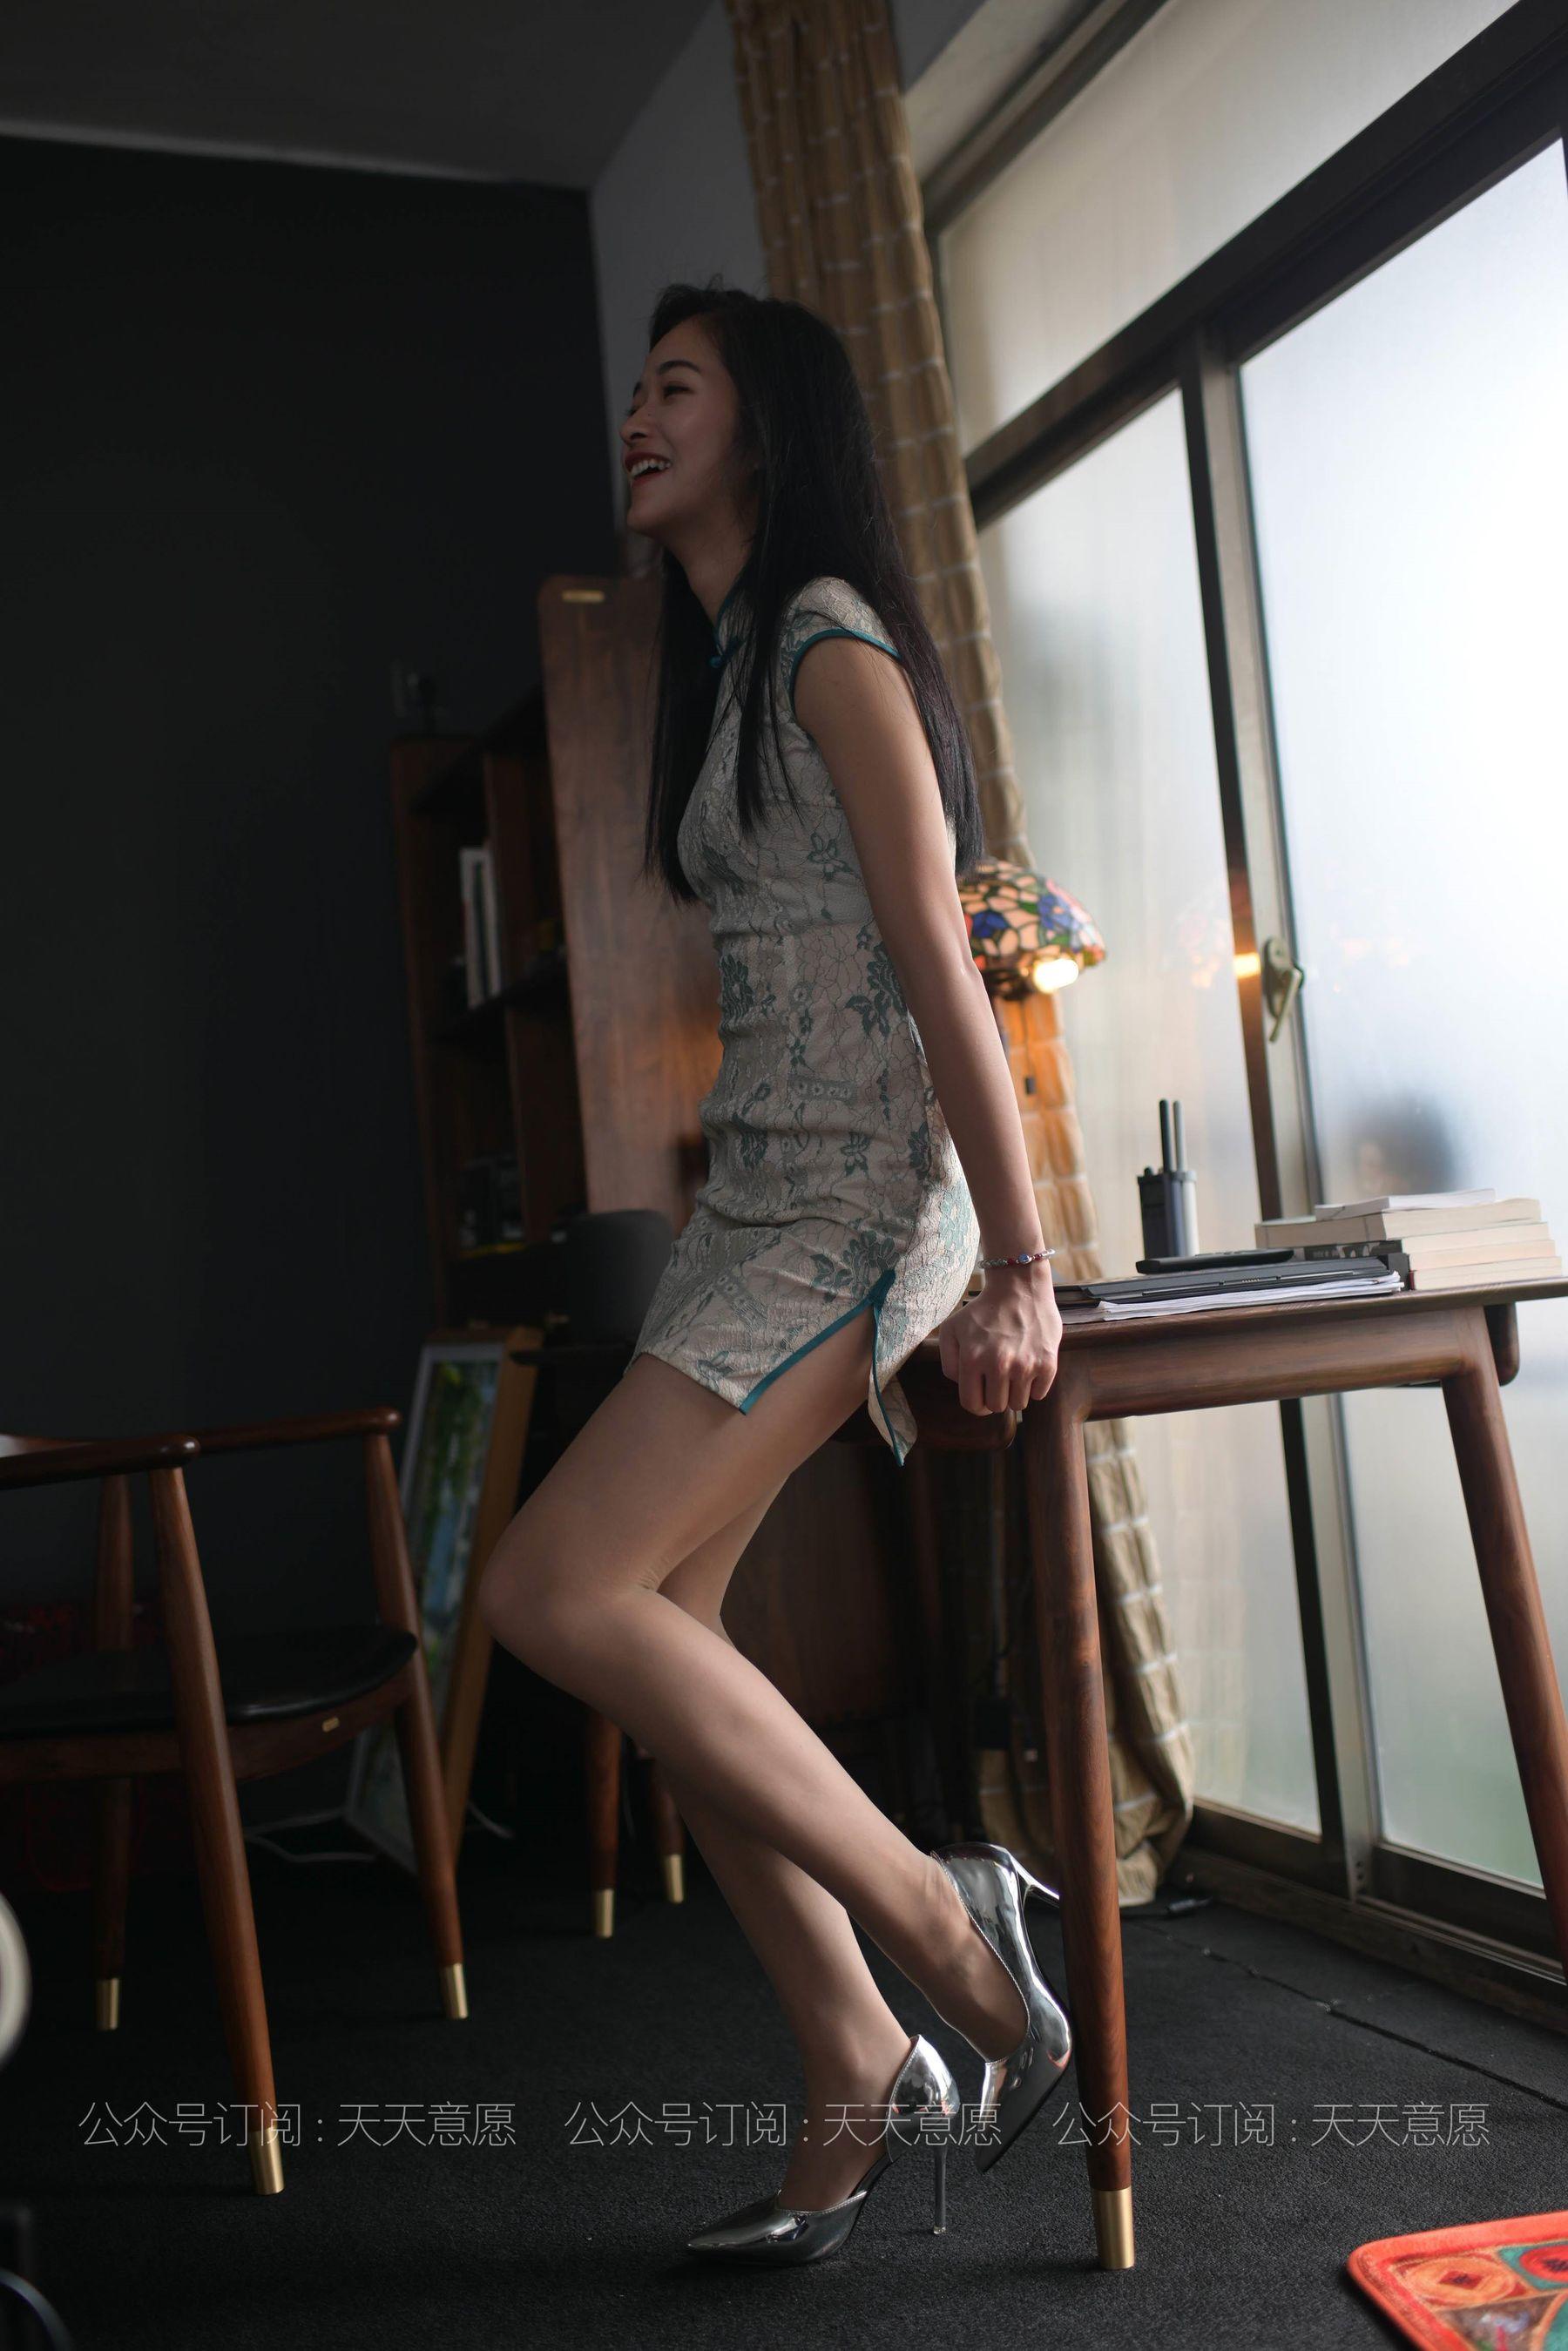 [IESS] 丝享家788: 宁宁《爱看书的旗袍美女》[77P]插图(3)